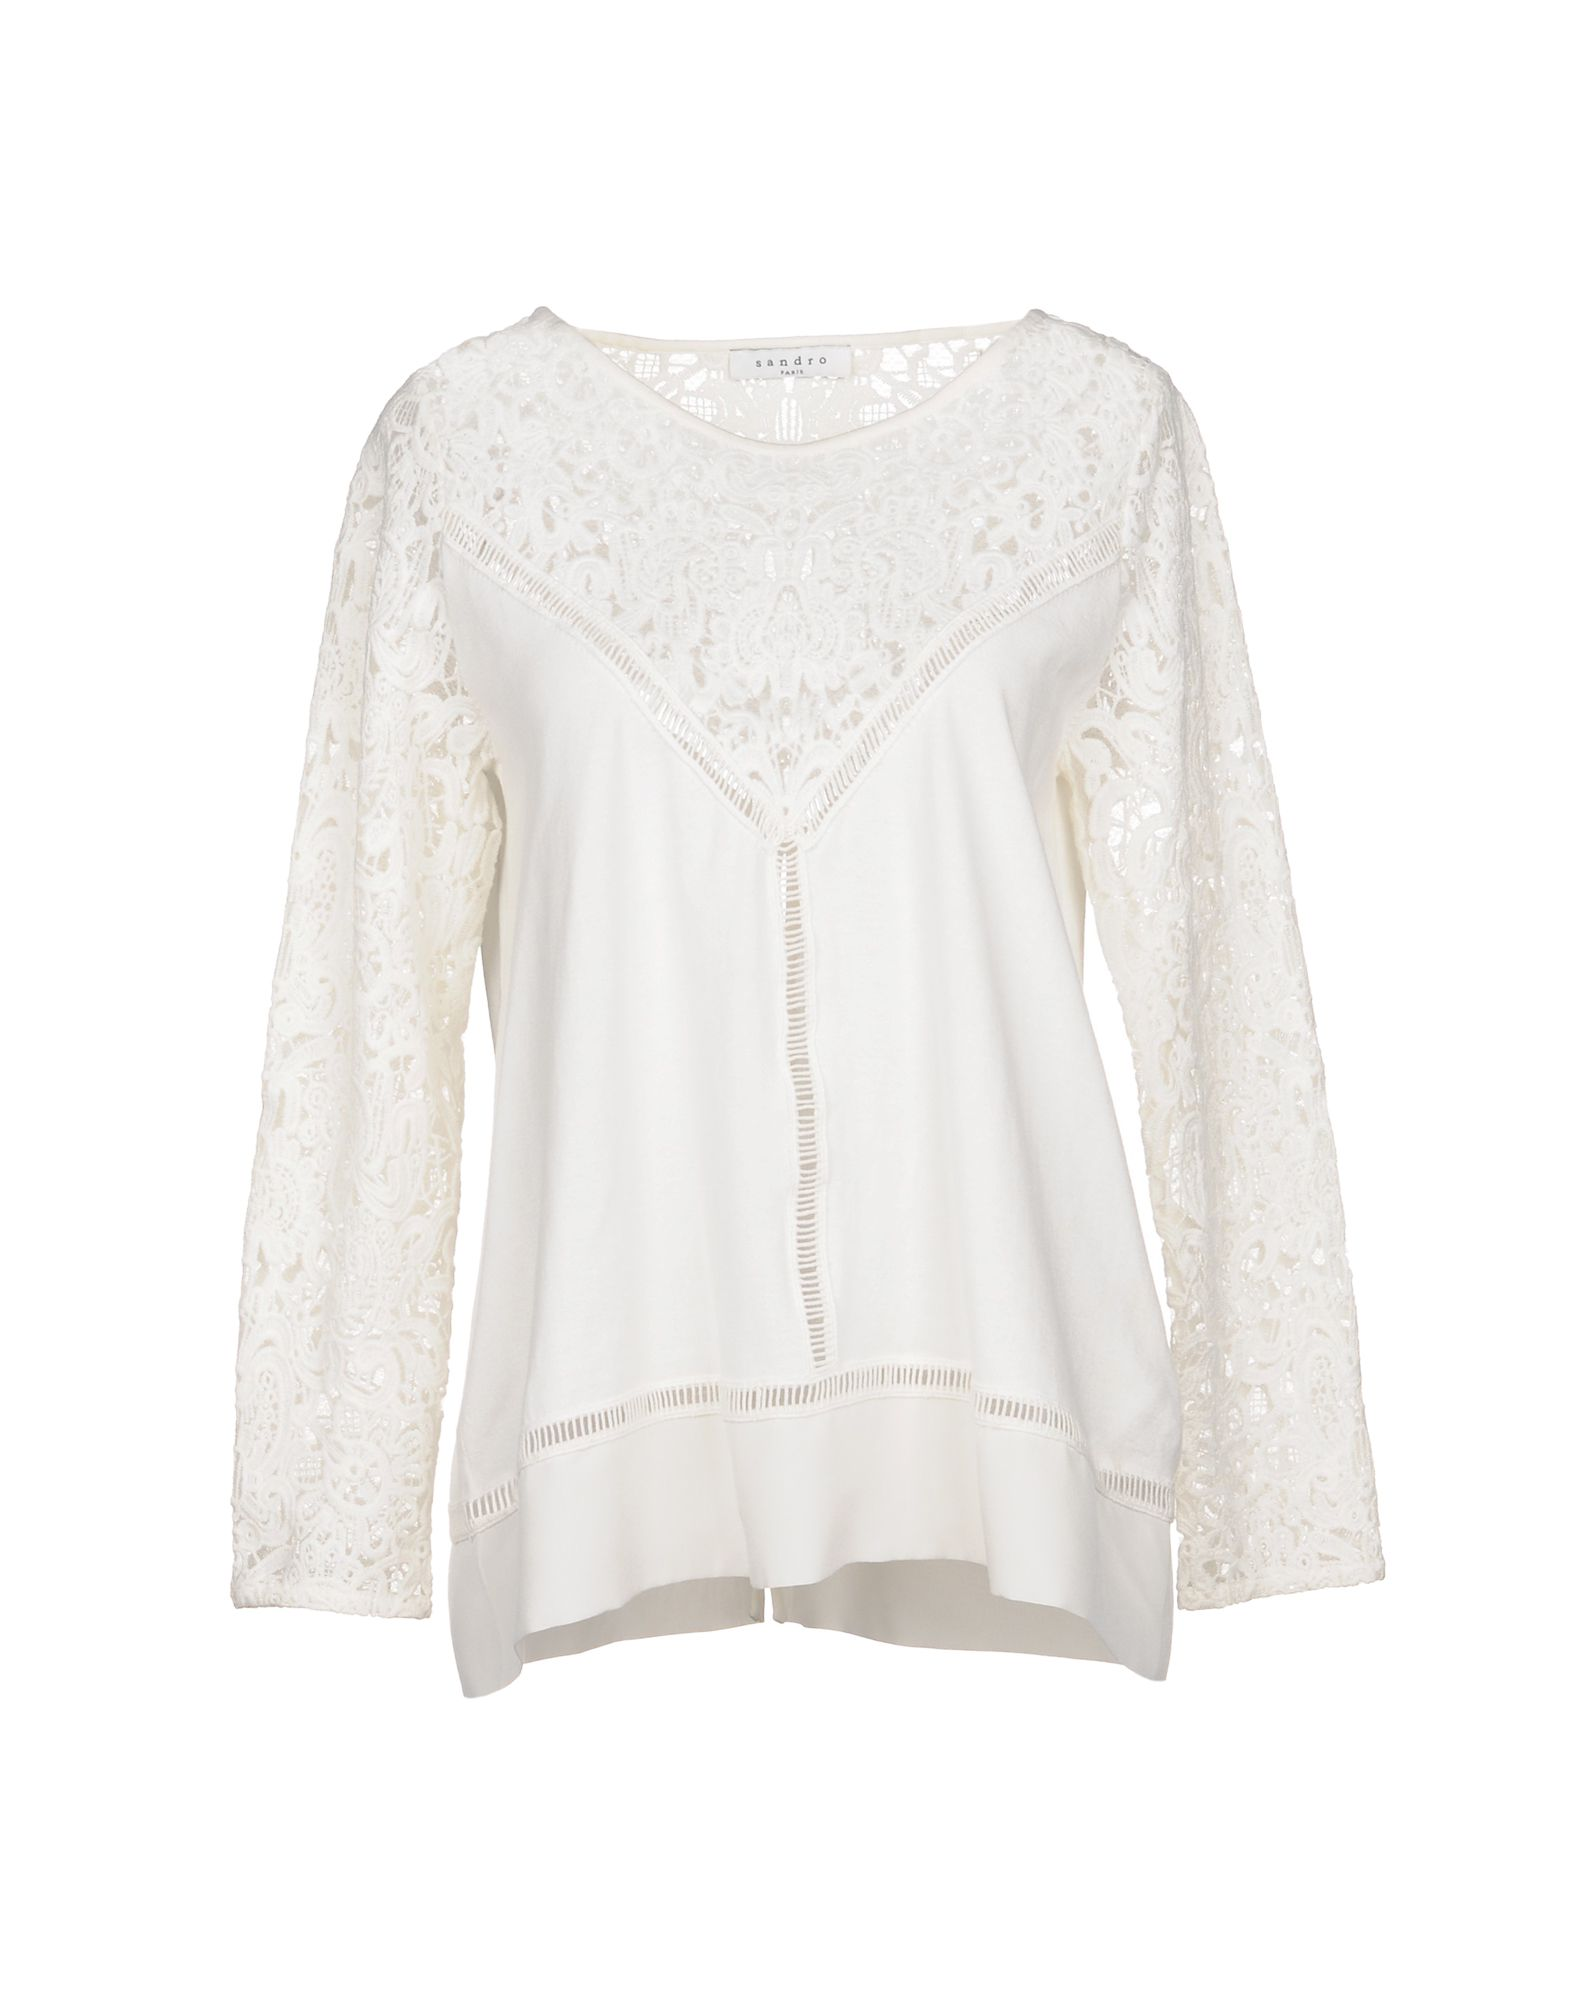 SANDRO PARIS Sweater in Ivory